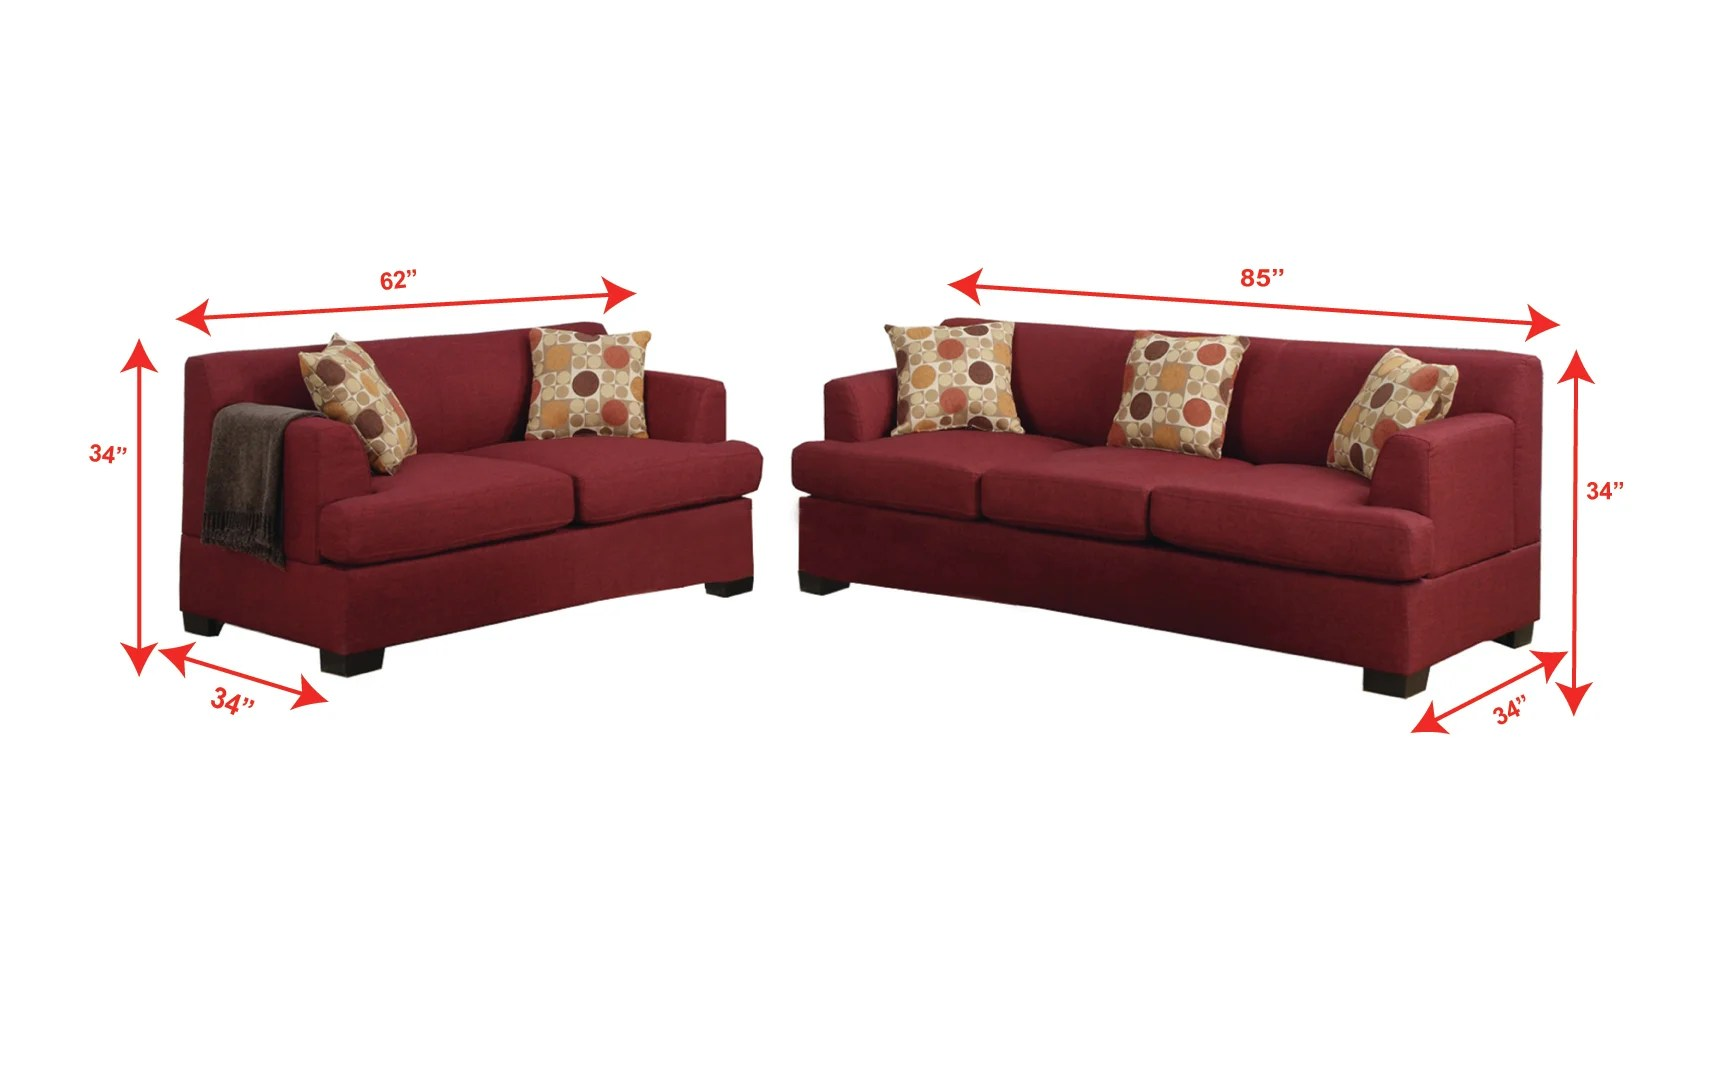 bobkona sectional sofa embly instructions recliner sets near me poundex baldwin and loveseat set ebay